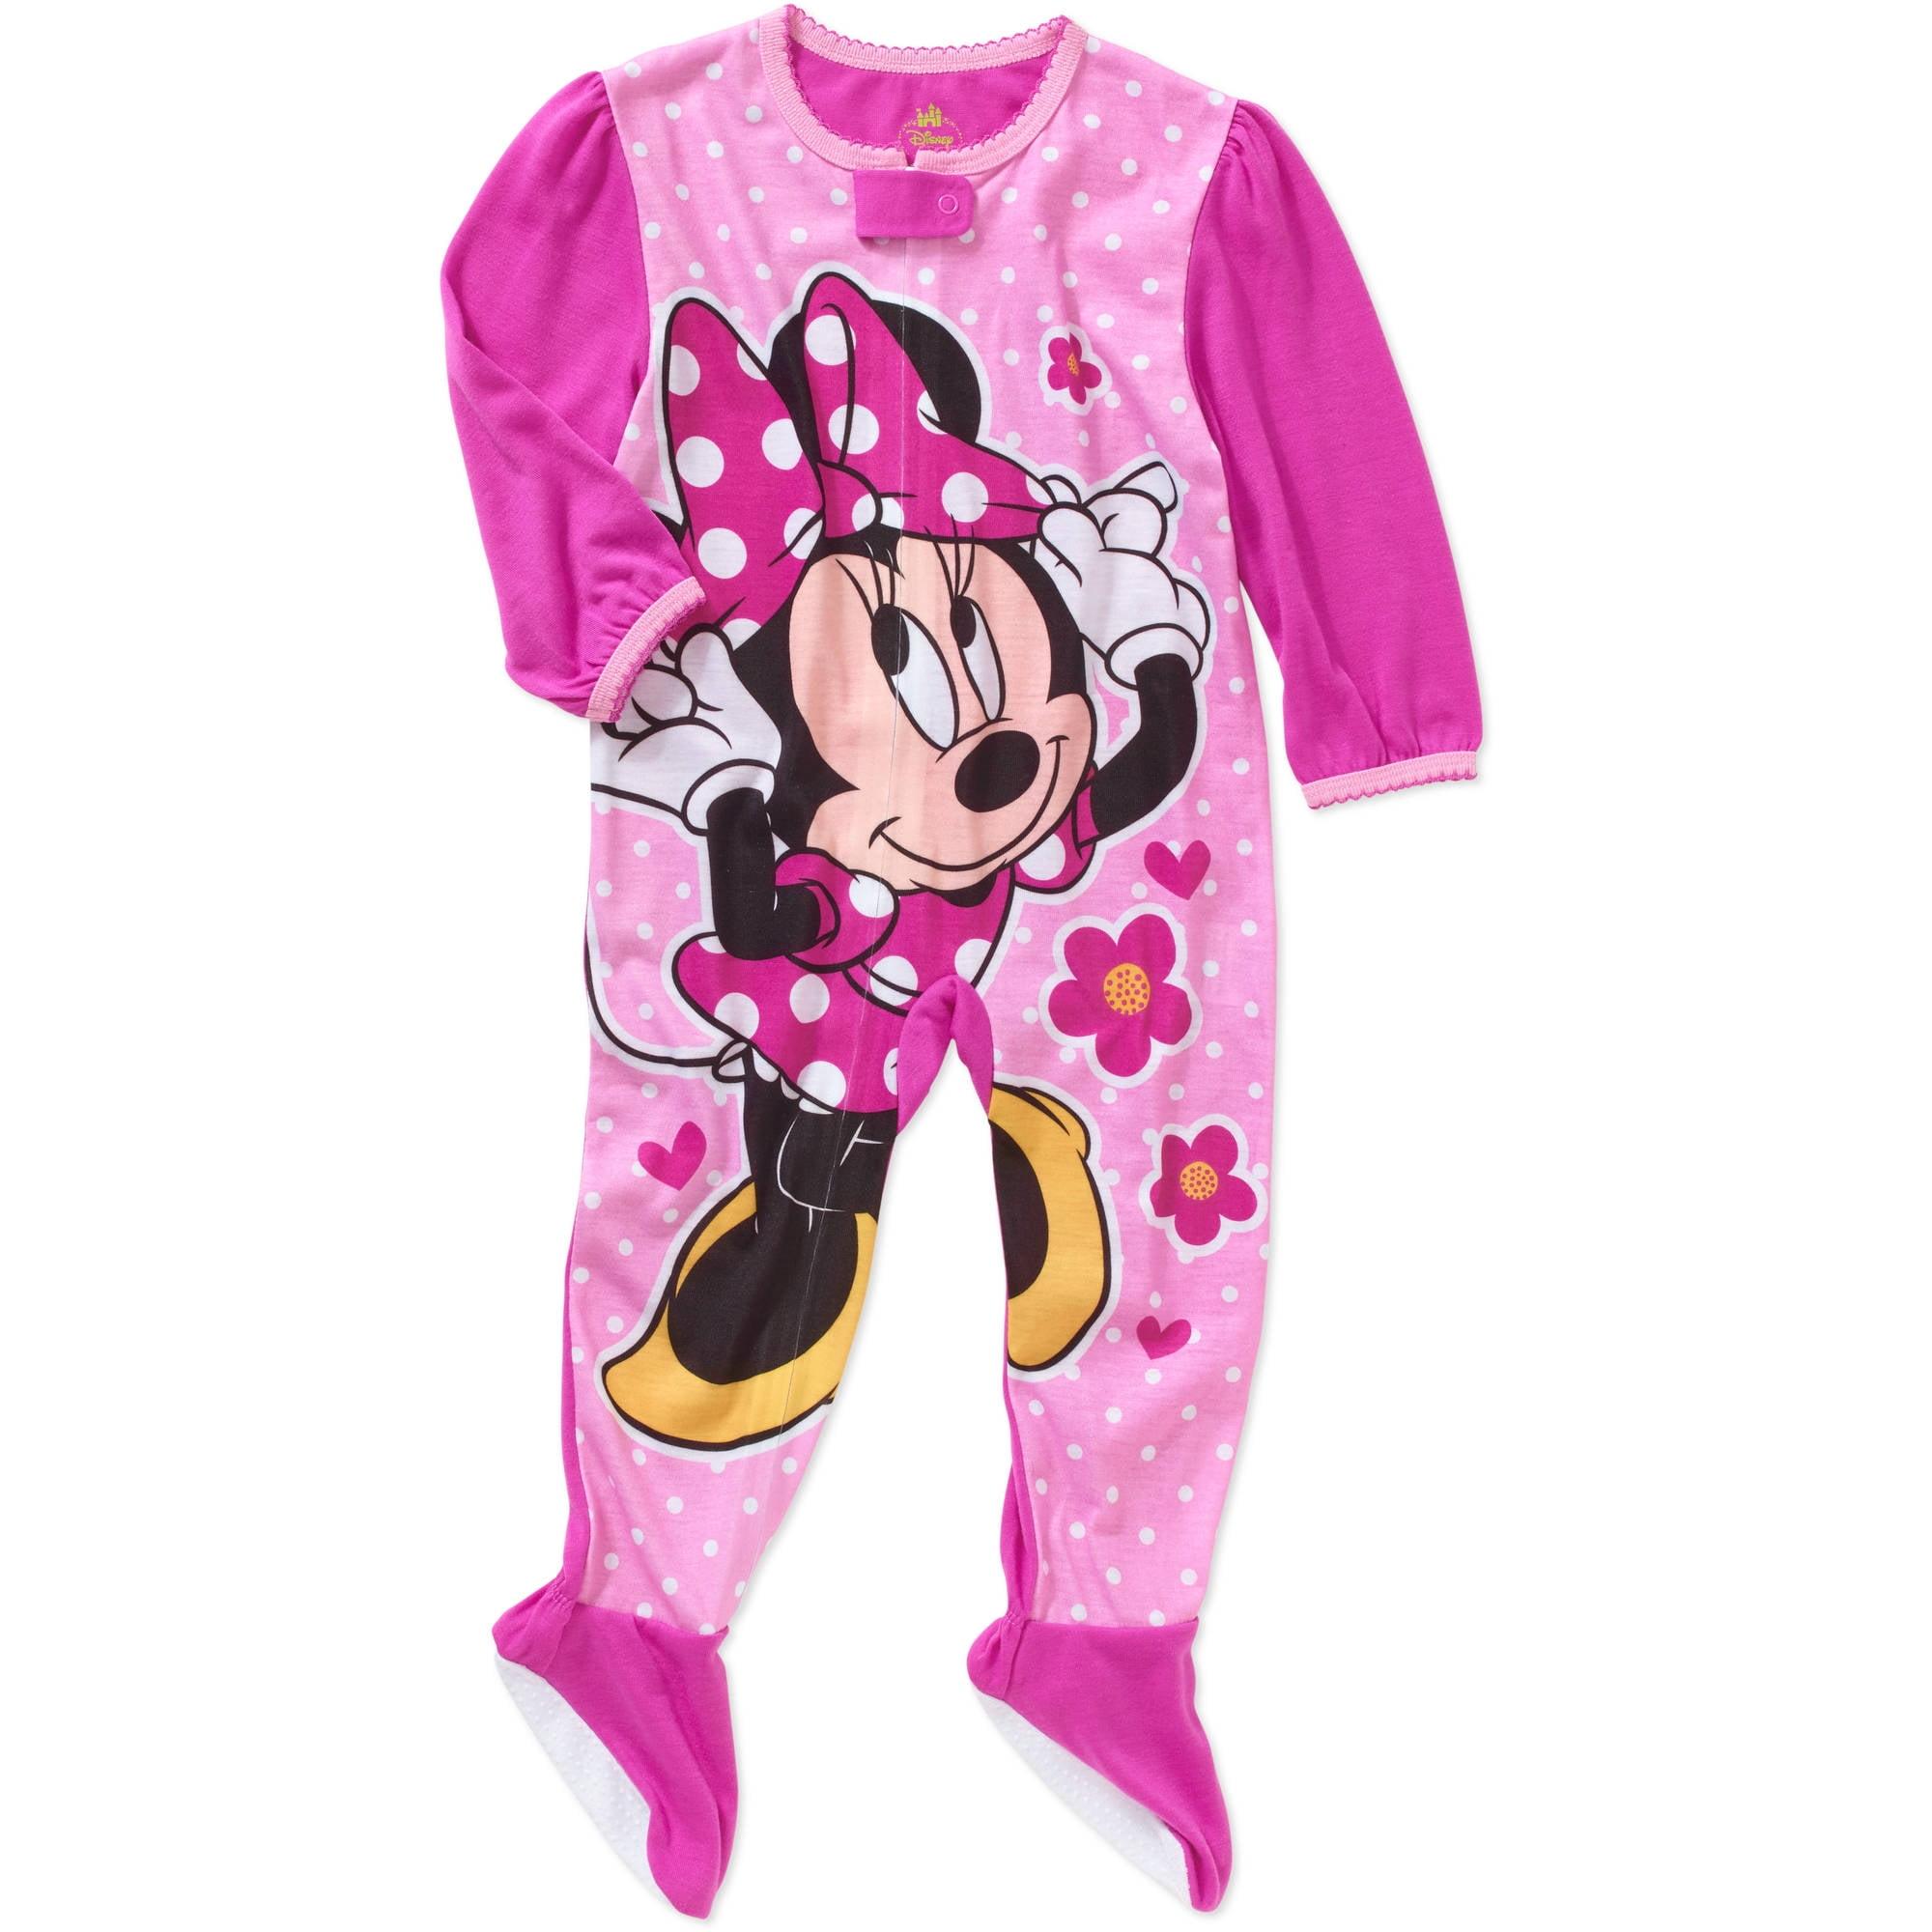 224e996406 Disney - Disney Girls  Minnie Mouse Hooded Blanket Sleeper Pajama Onesie -  Walmart.com